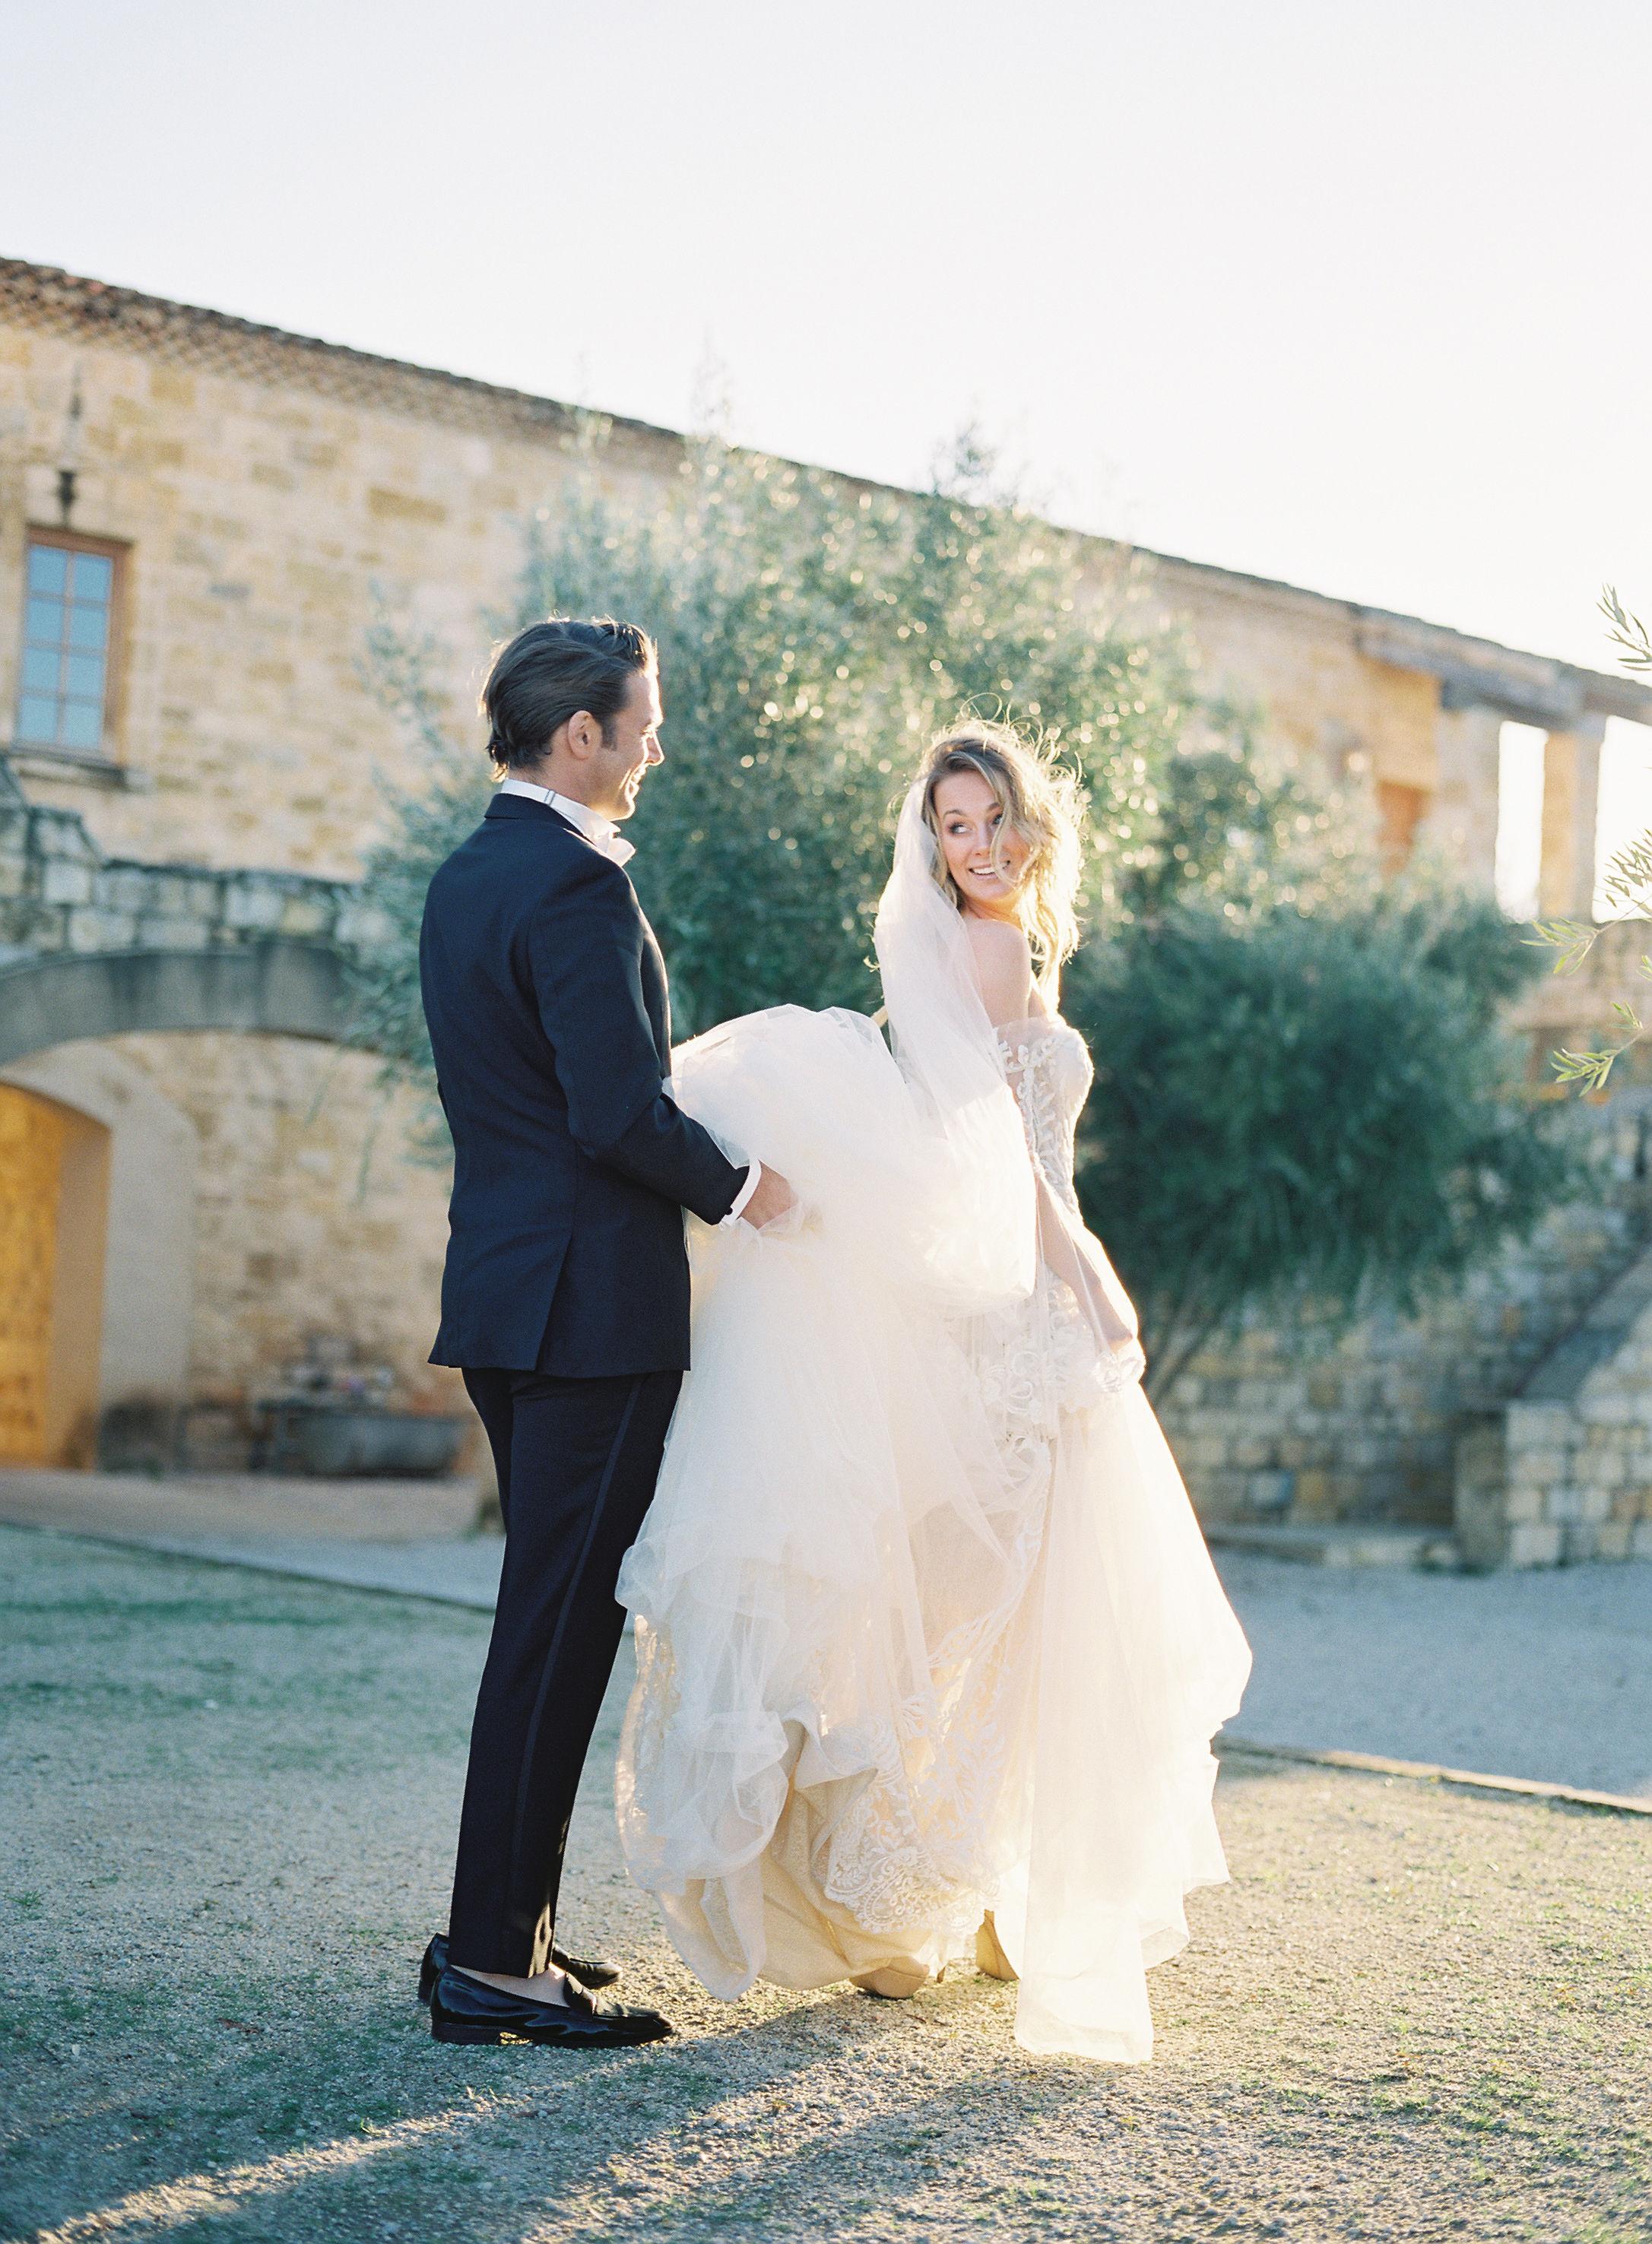 jessica-zimmerman-events-sunstone-wedding-groom-bride-veil.jpg